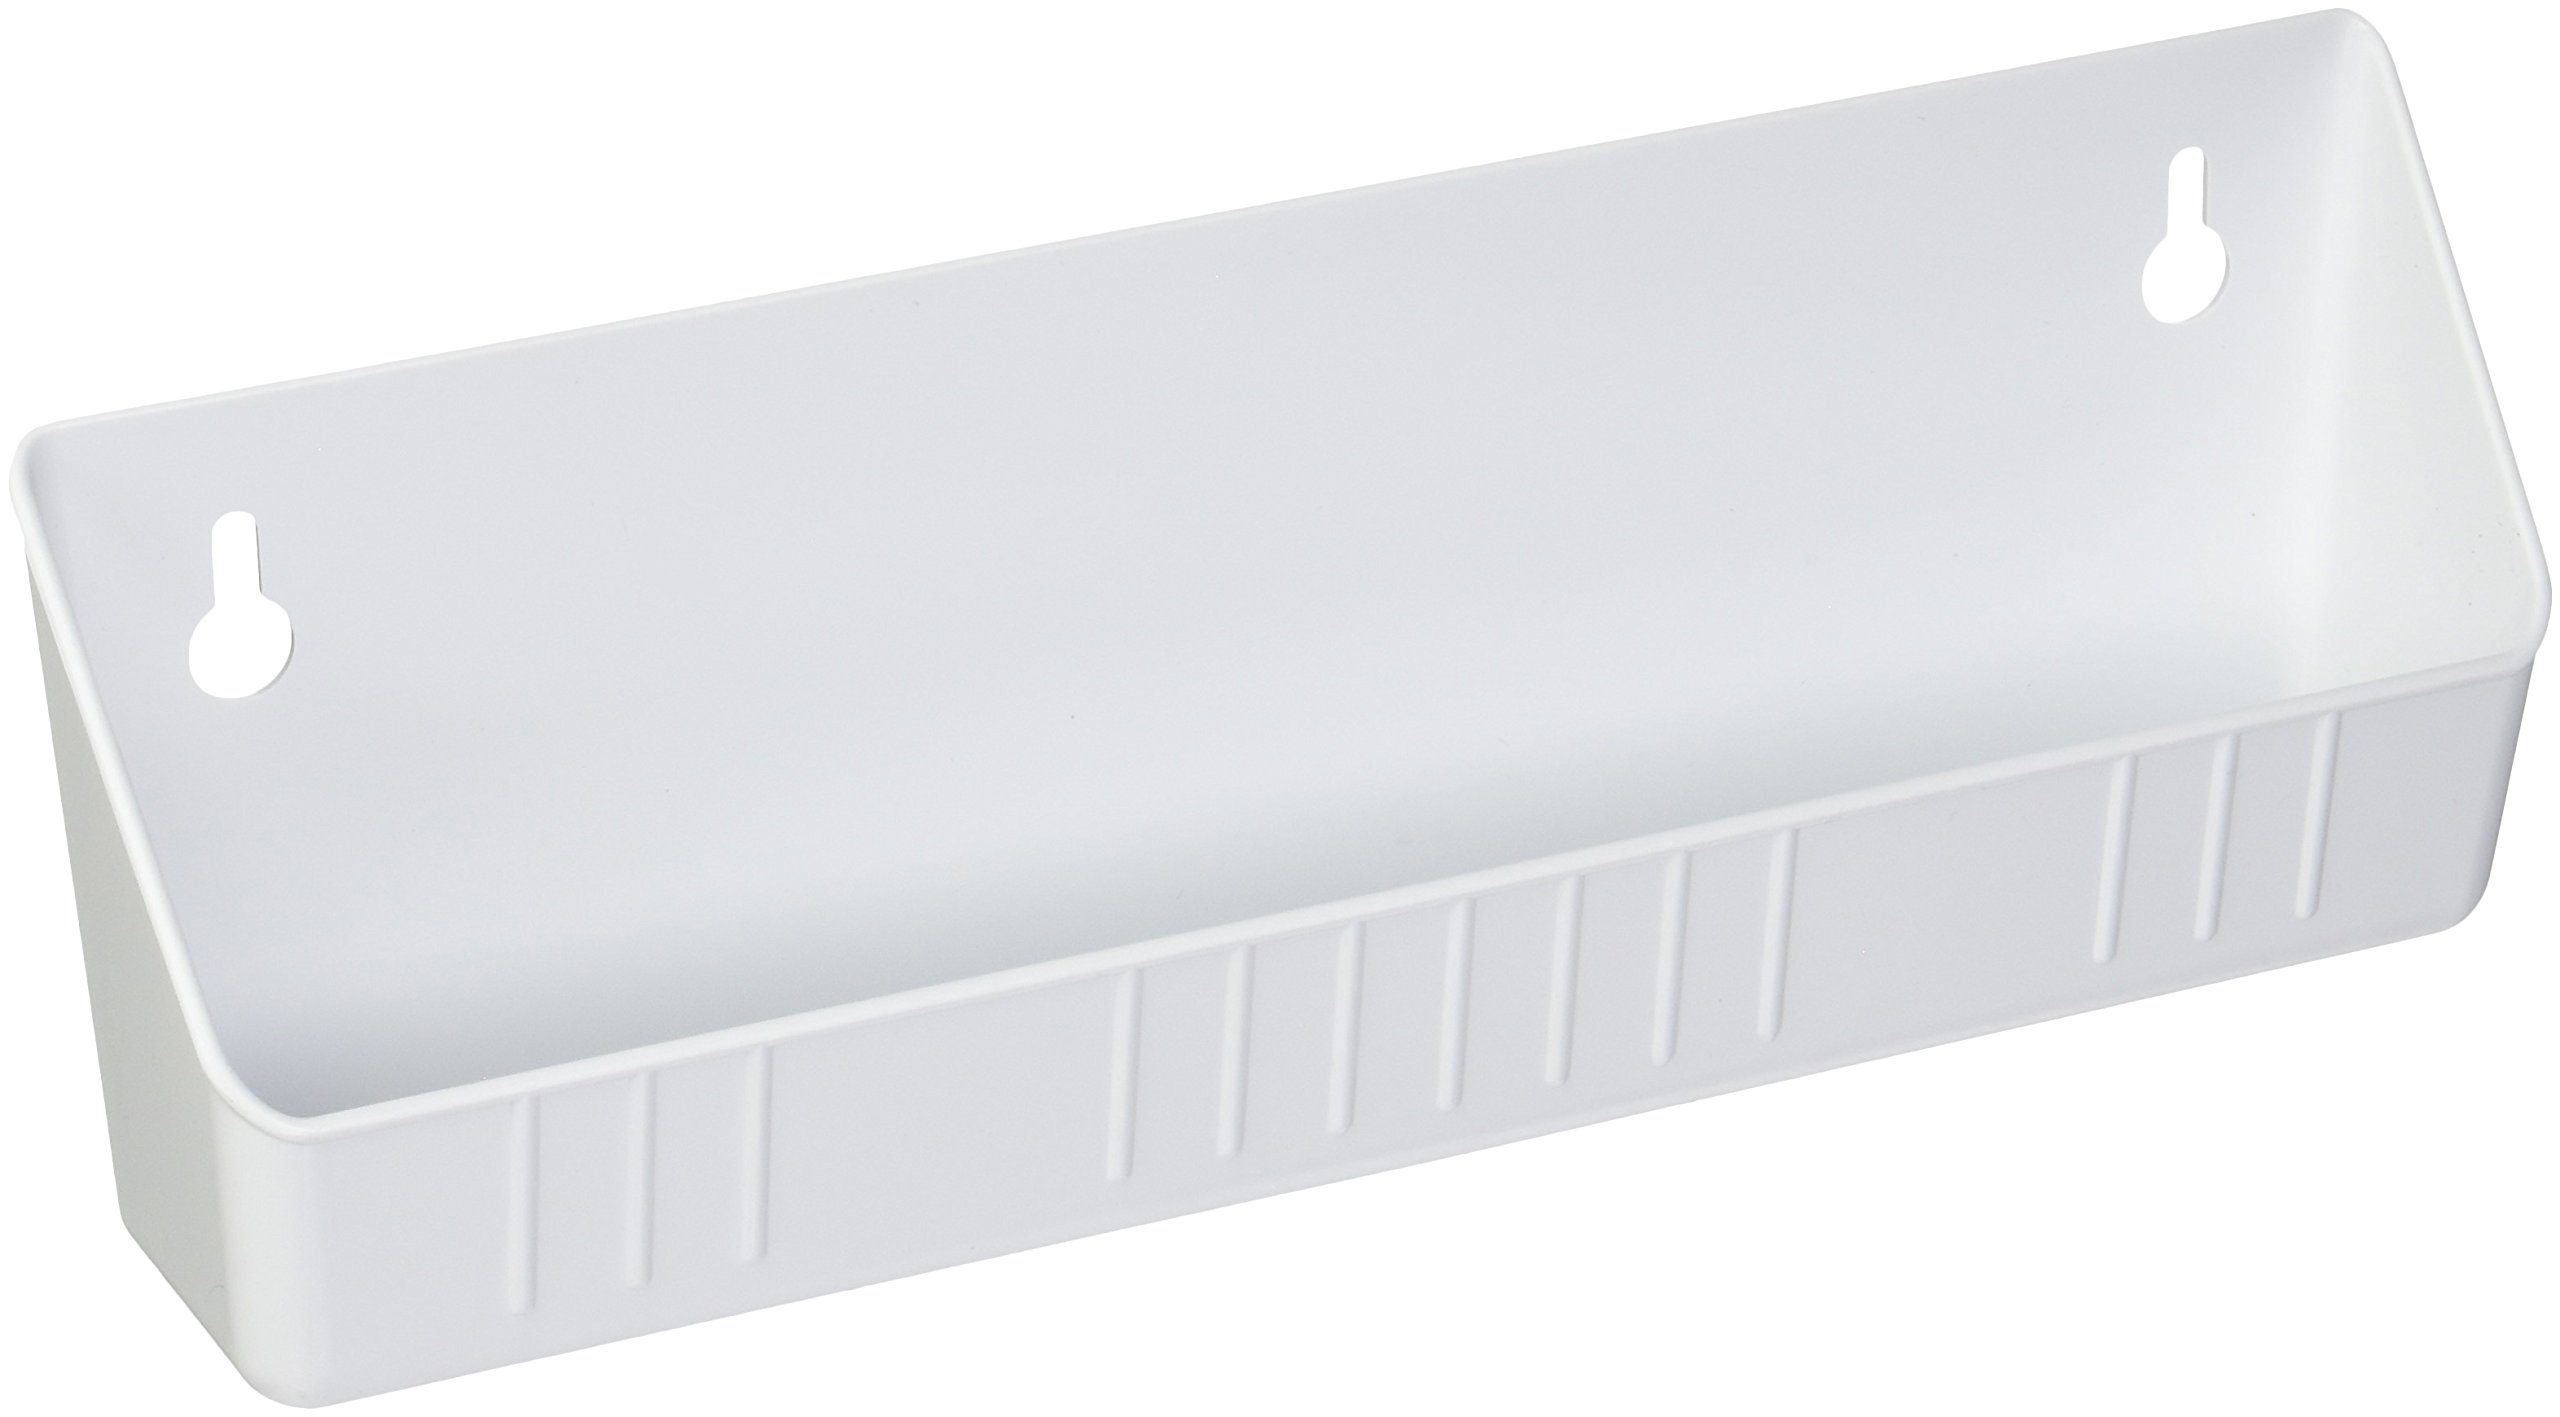 Rev-A-Shelf 6581 Sink Front Tray, Standard, White by Rev-A-Shelf